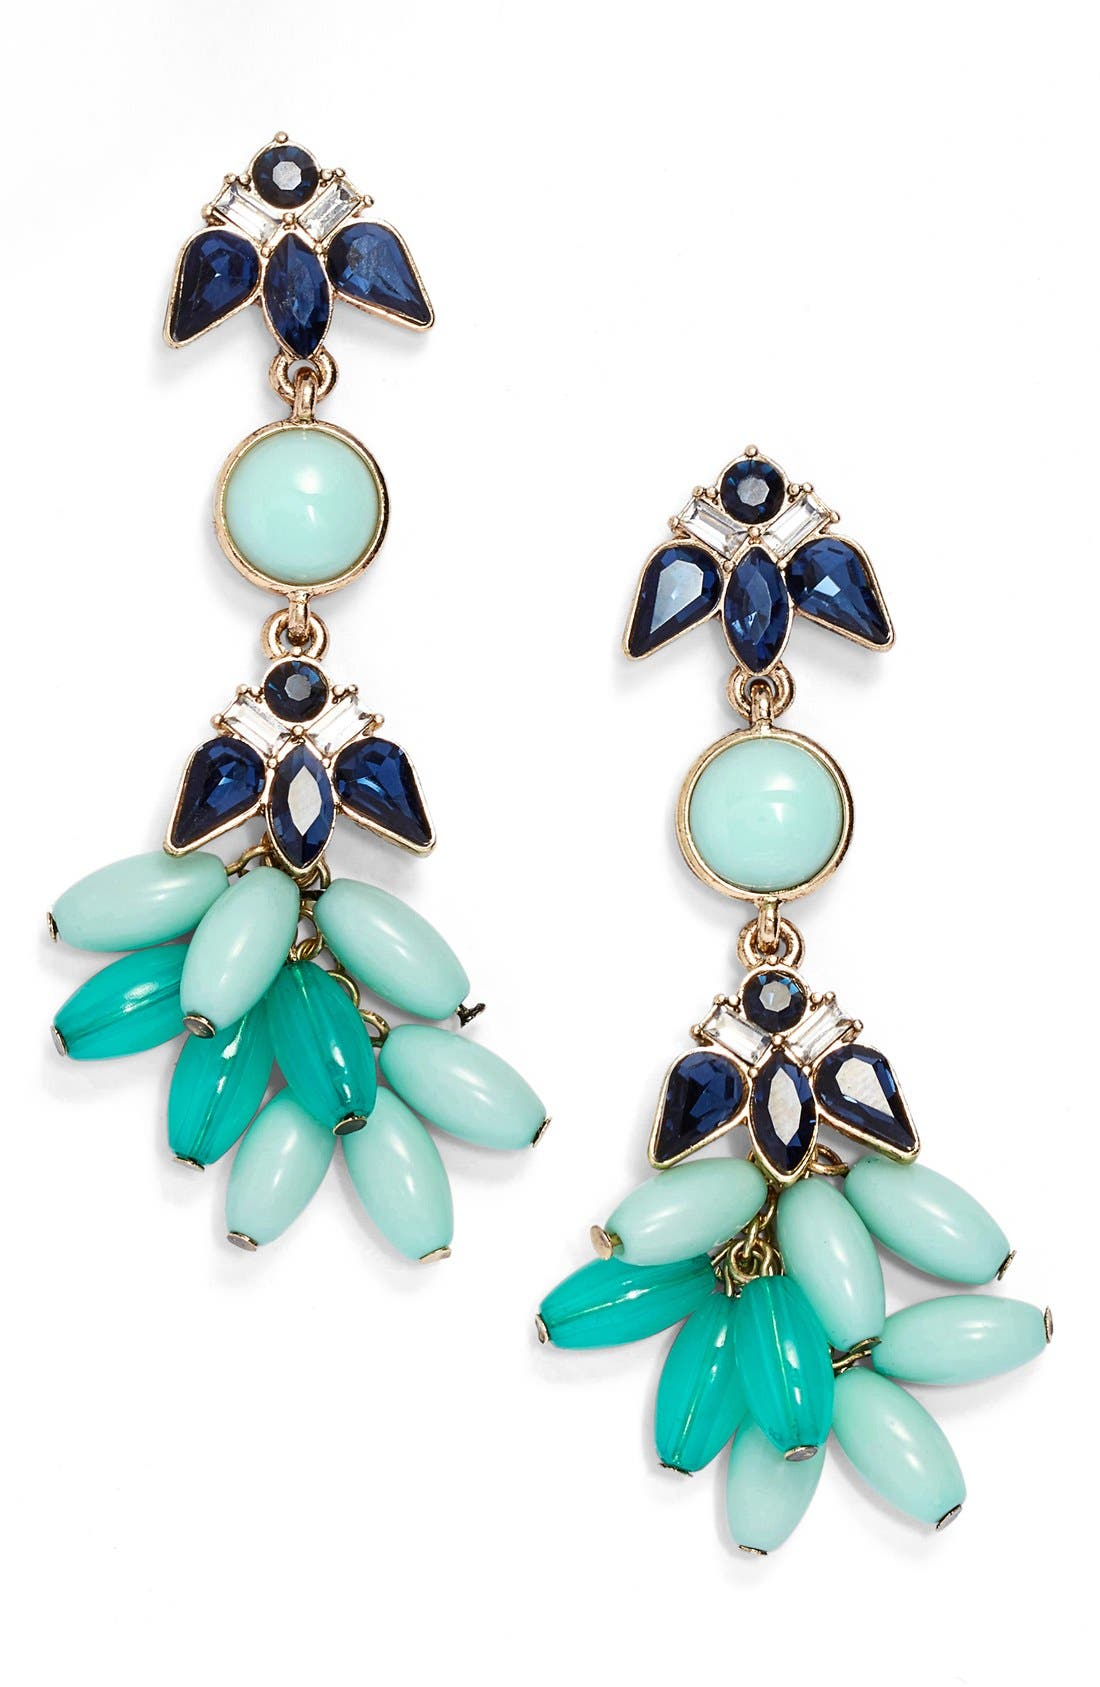 Main Image - BaubleBar 'Stella' Drop Earrings